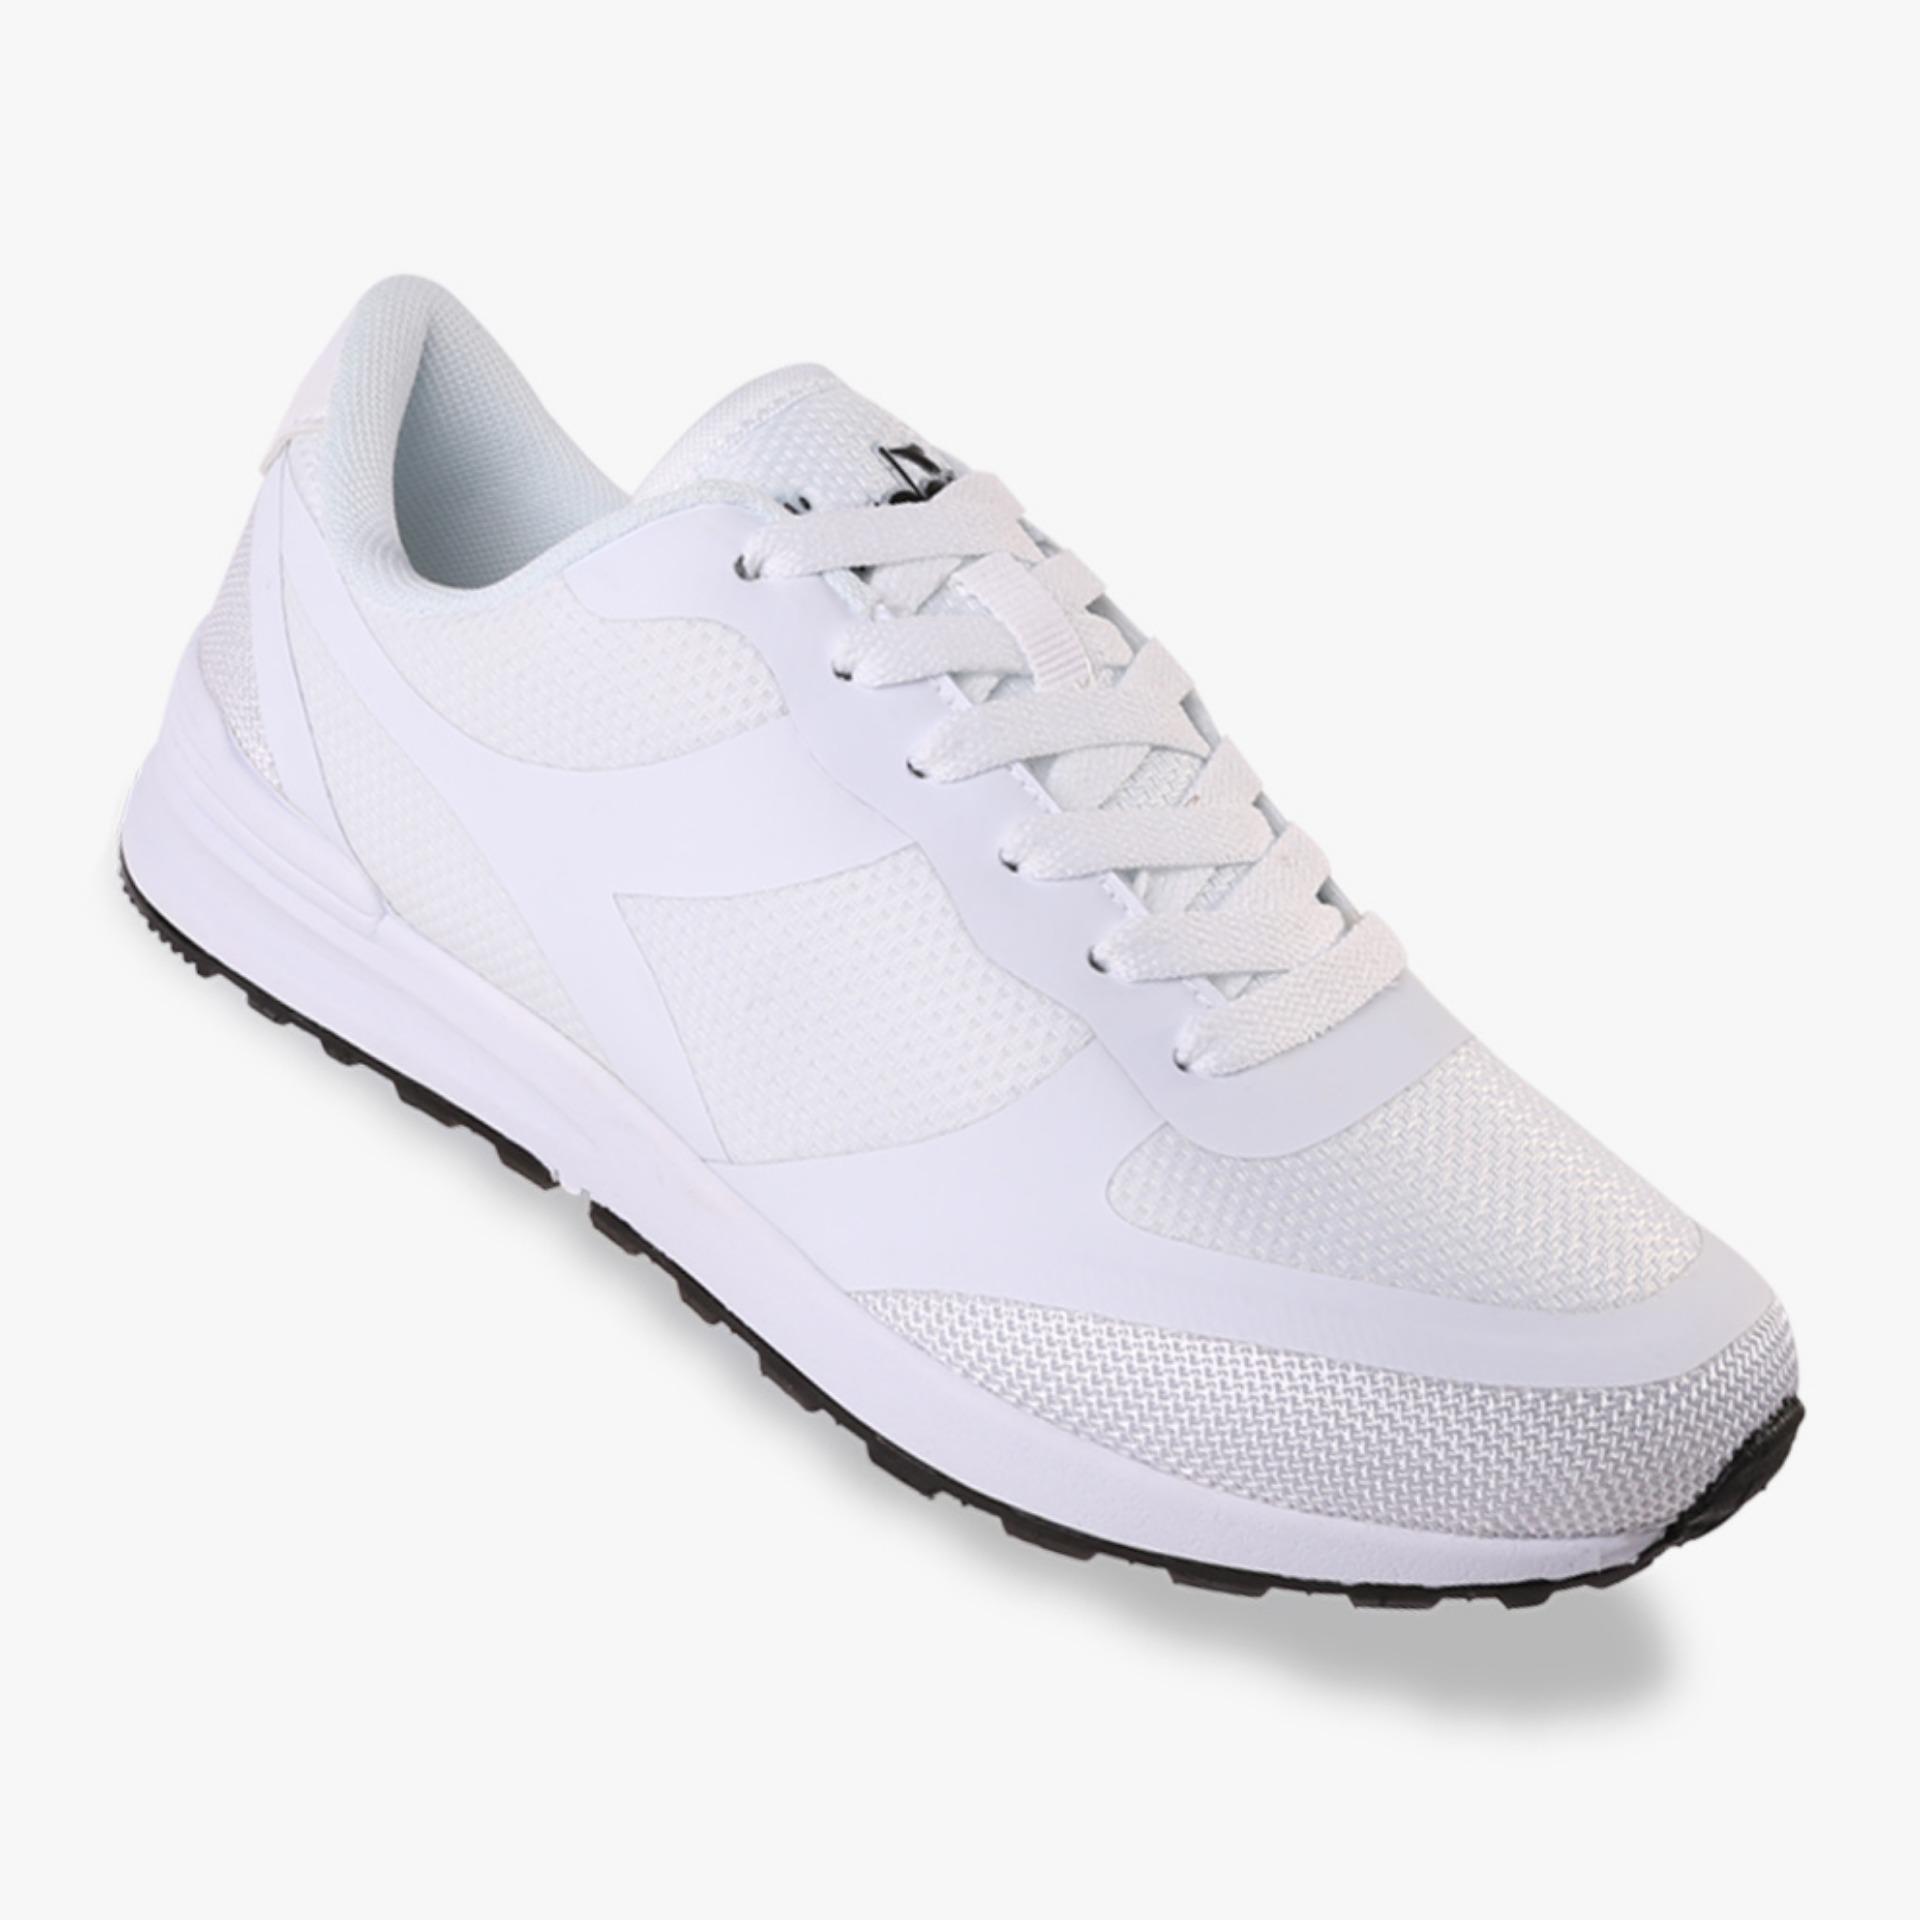 Harga Diadora Erasto Unisex Sneakers Shoes Putih Branded